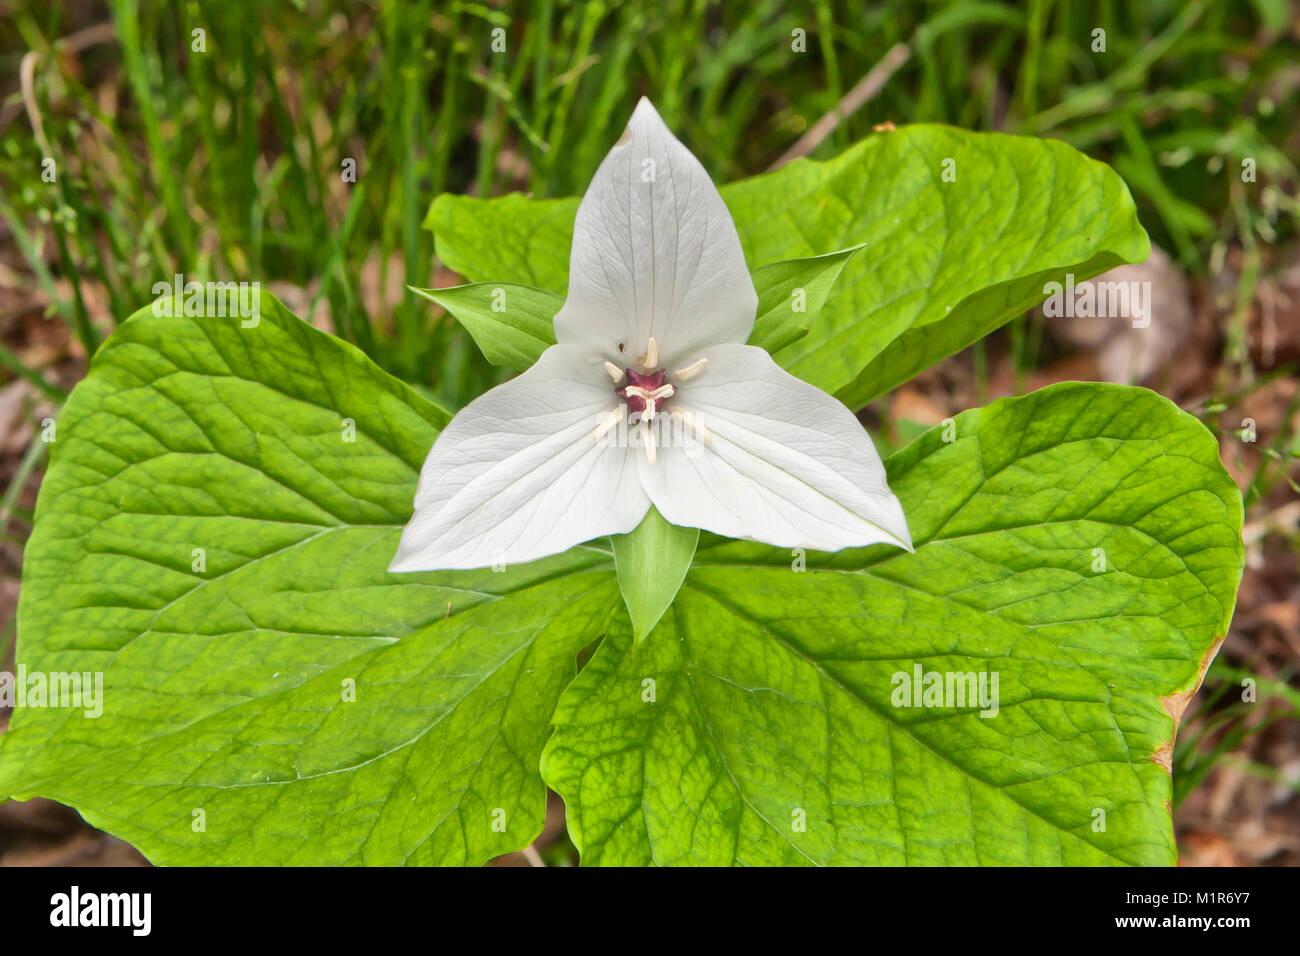 Jeweled Wakerobin (Trillium simile) - Stock Image